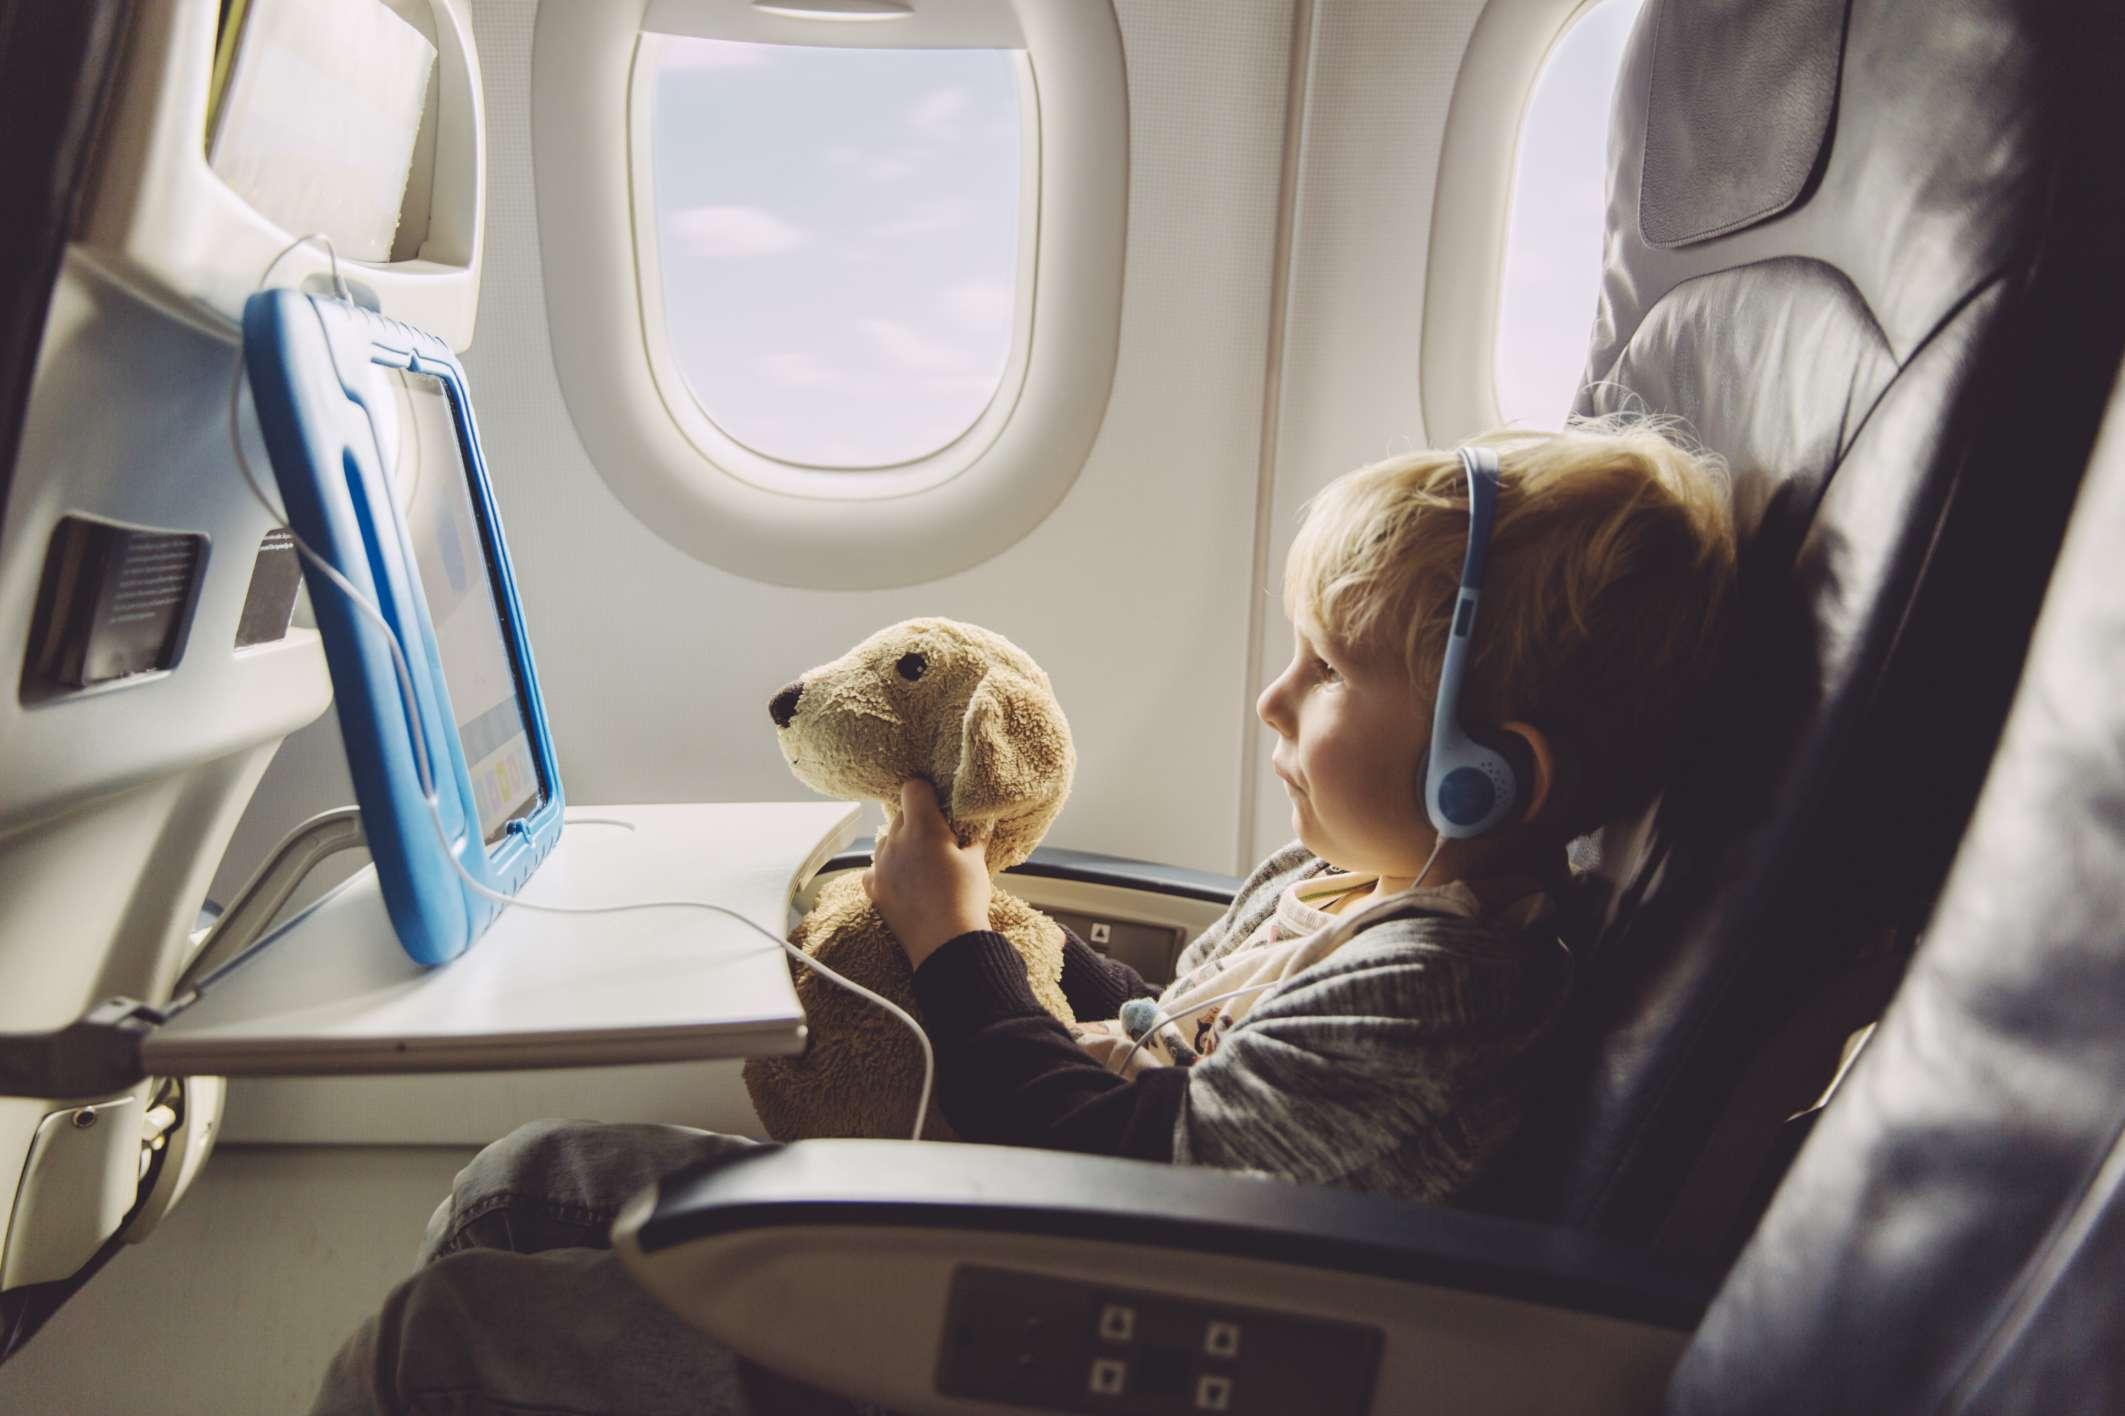 Little boy watching movie on plane with stuffed animal